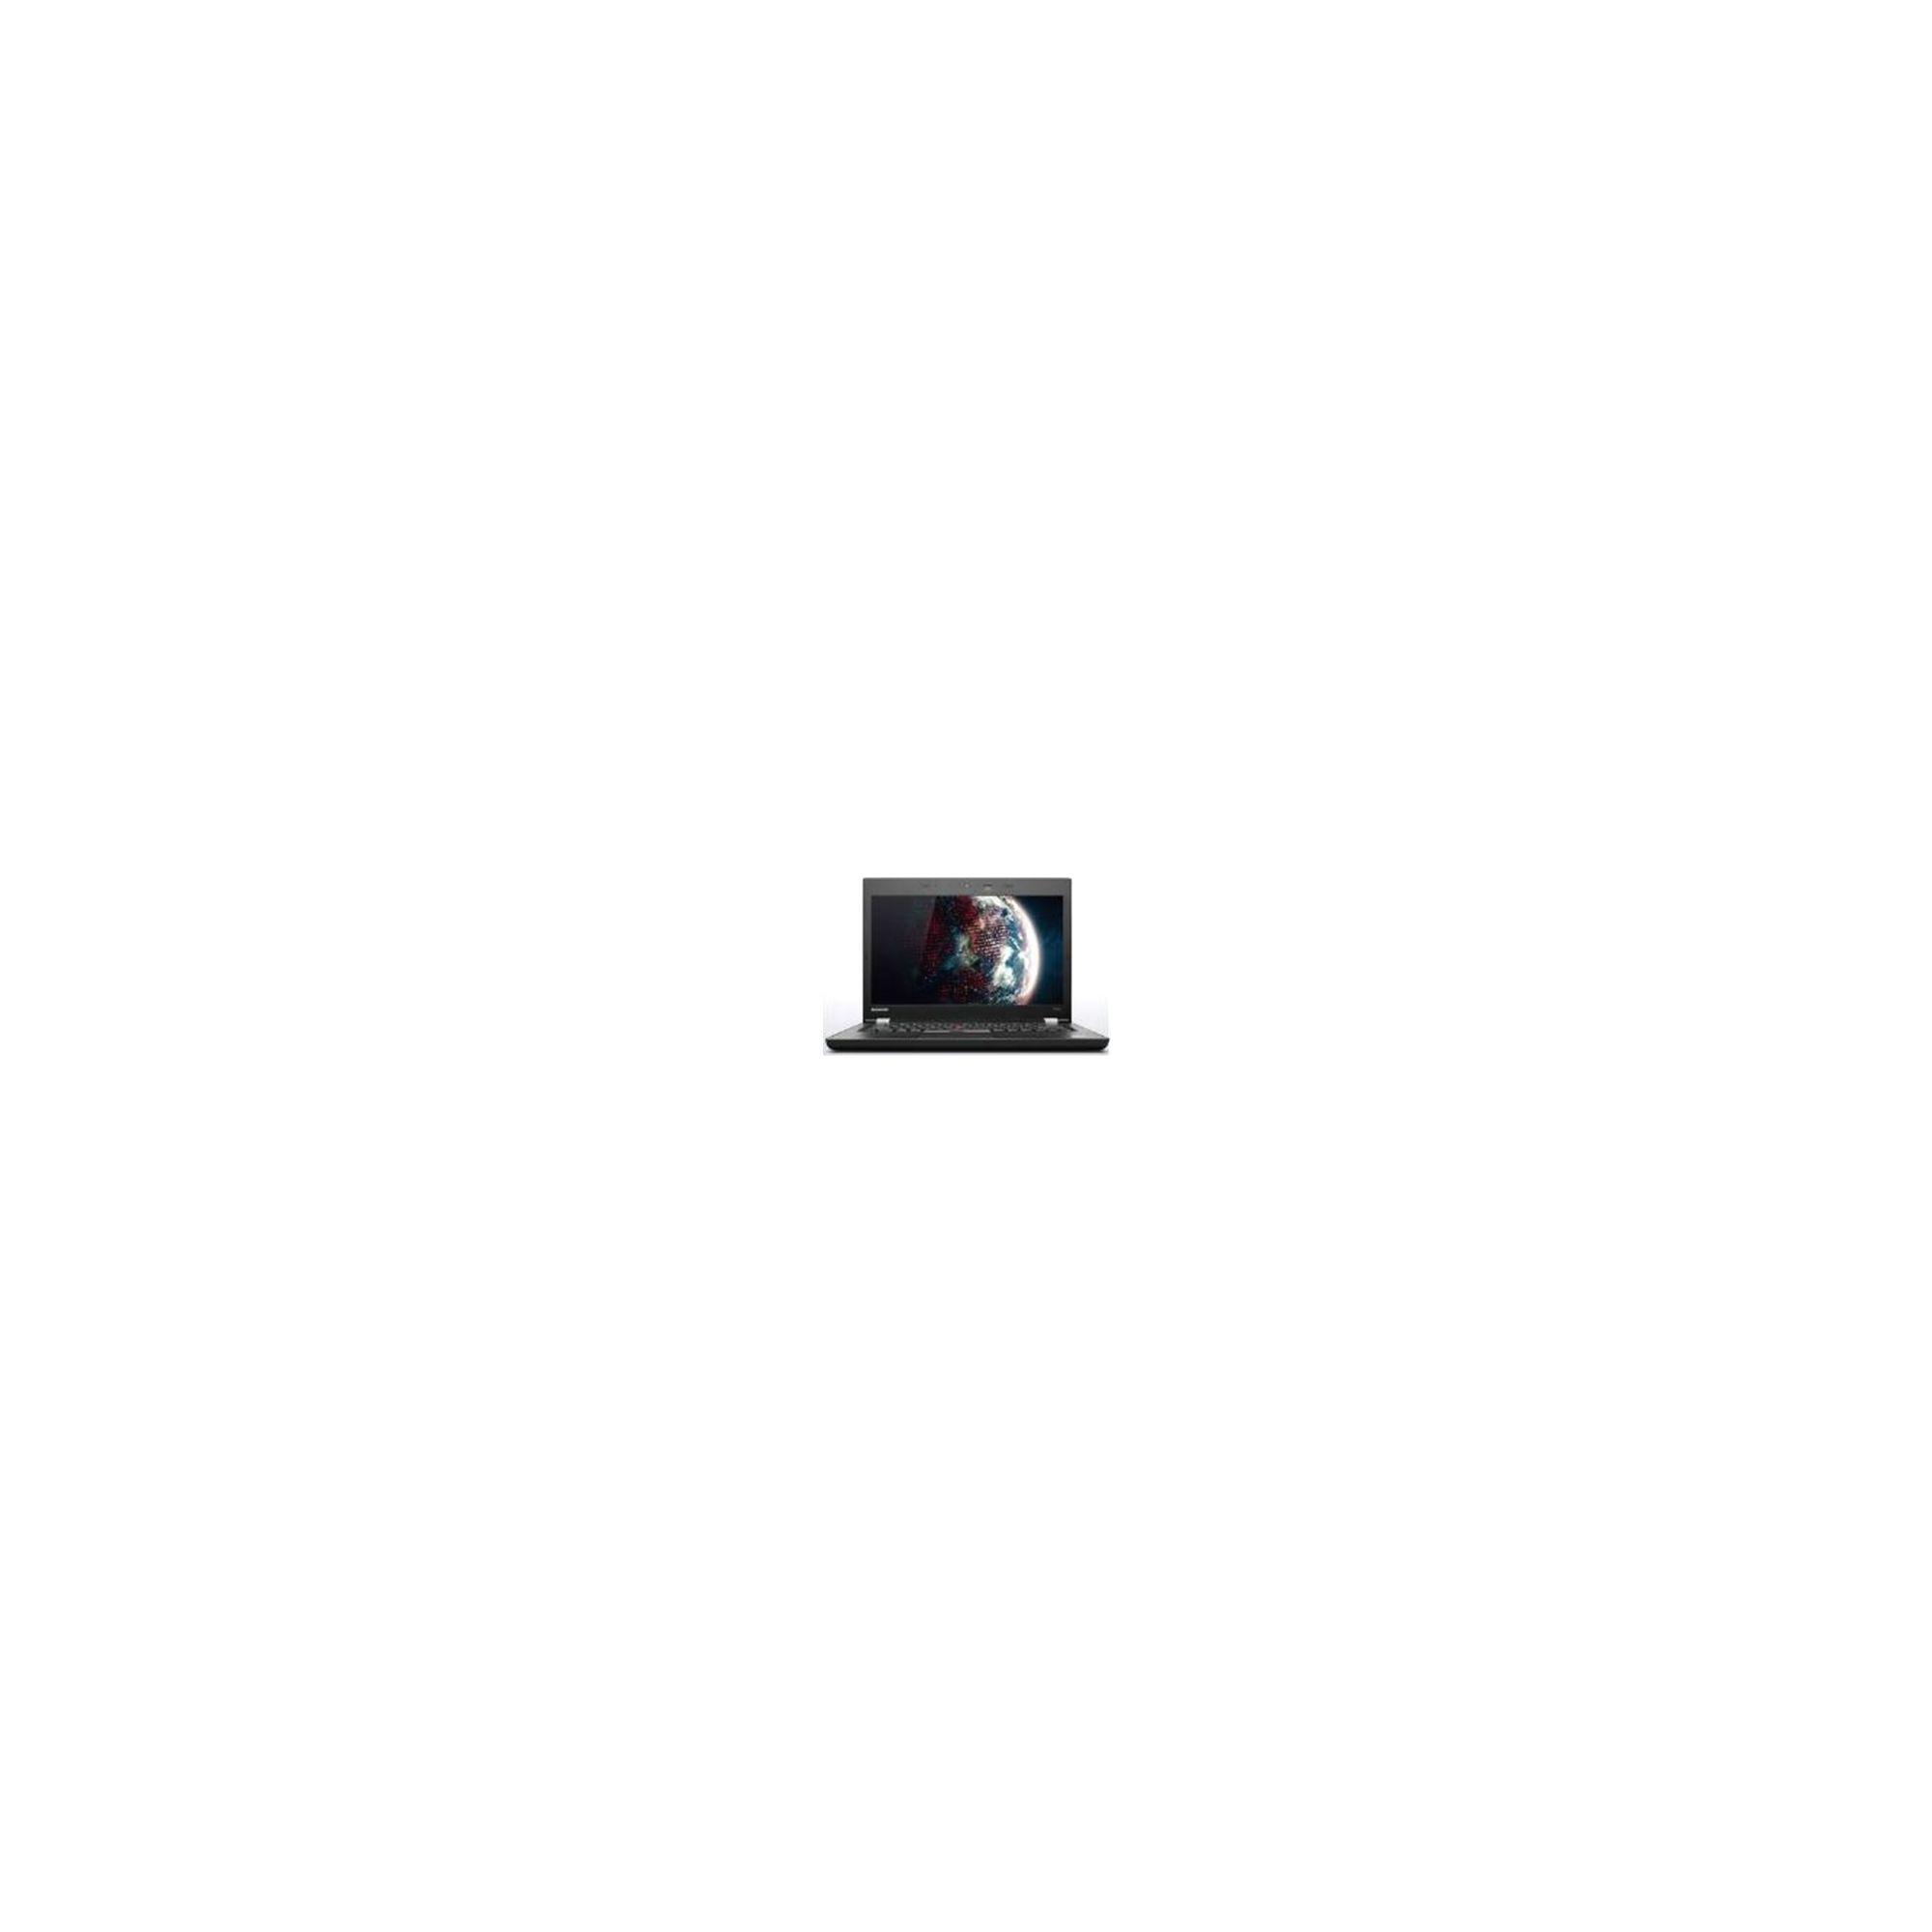 Lenovo ThinkPad T430u 33533LG (14.0 inch) Notebook Core i5 (3317U) 1.7GHz 4GB 500GB WLAN BT Webcam Windows 7 Pro 64-bit/Windows 8 Pro 64-bit RDVD at Tesco Direct